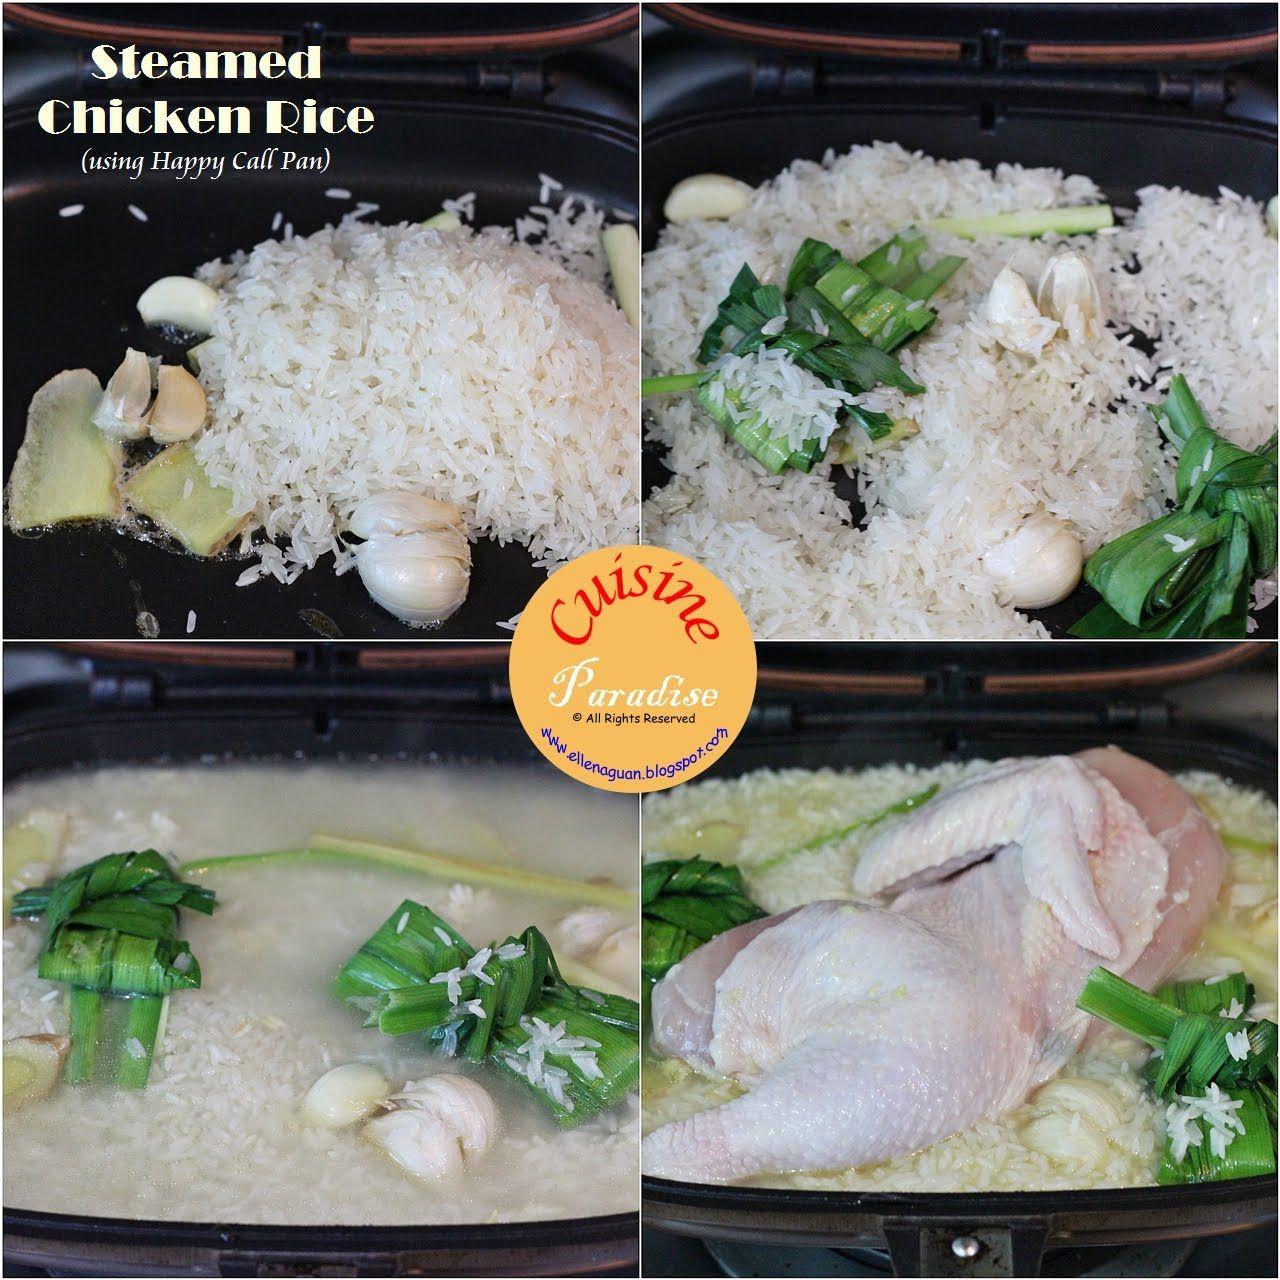 Cuisine paradise singapore food blog recipes food reviews cuisine paradise singapore food blog recipes food reviews travel chicken rice forumfinder Images